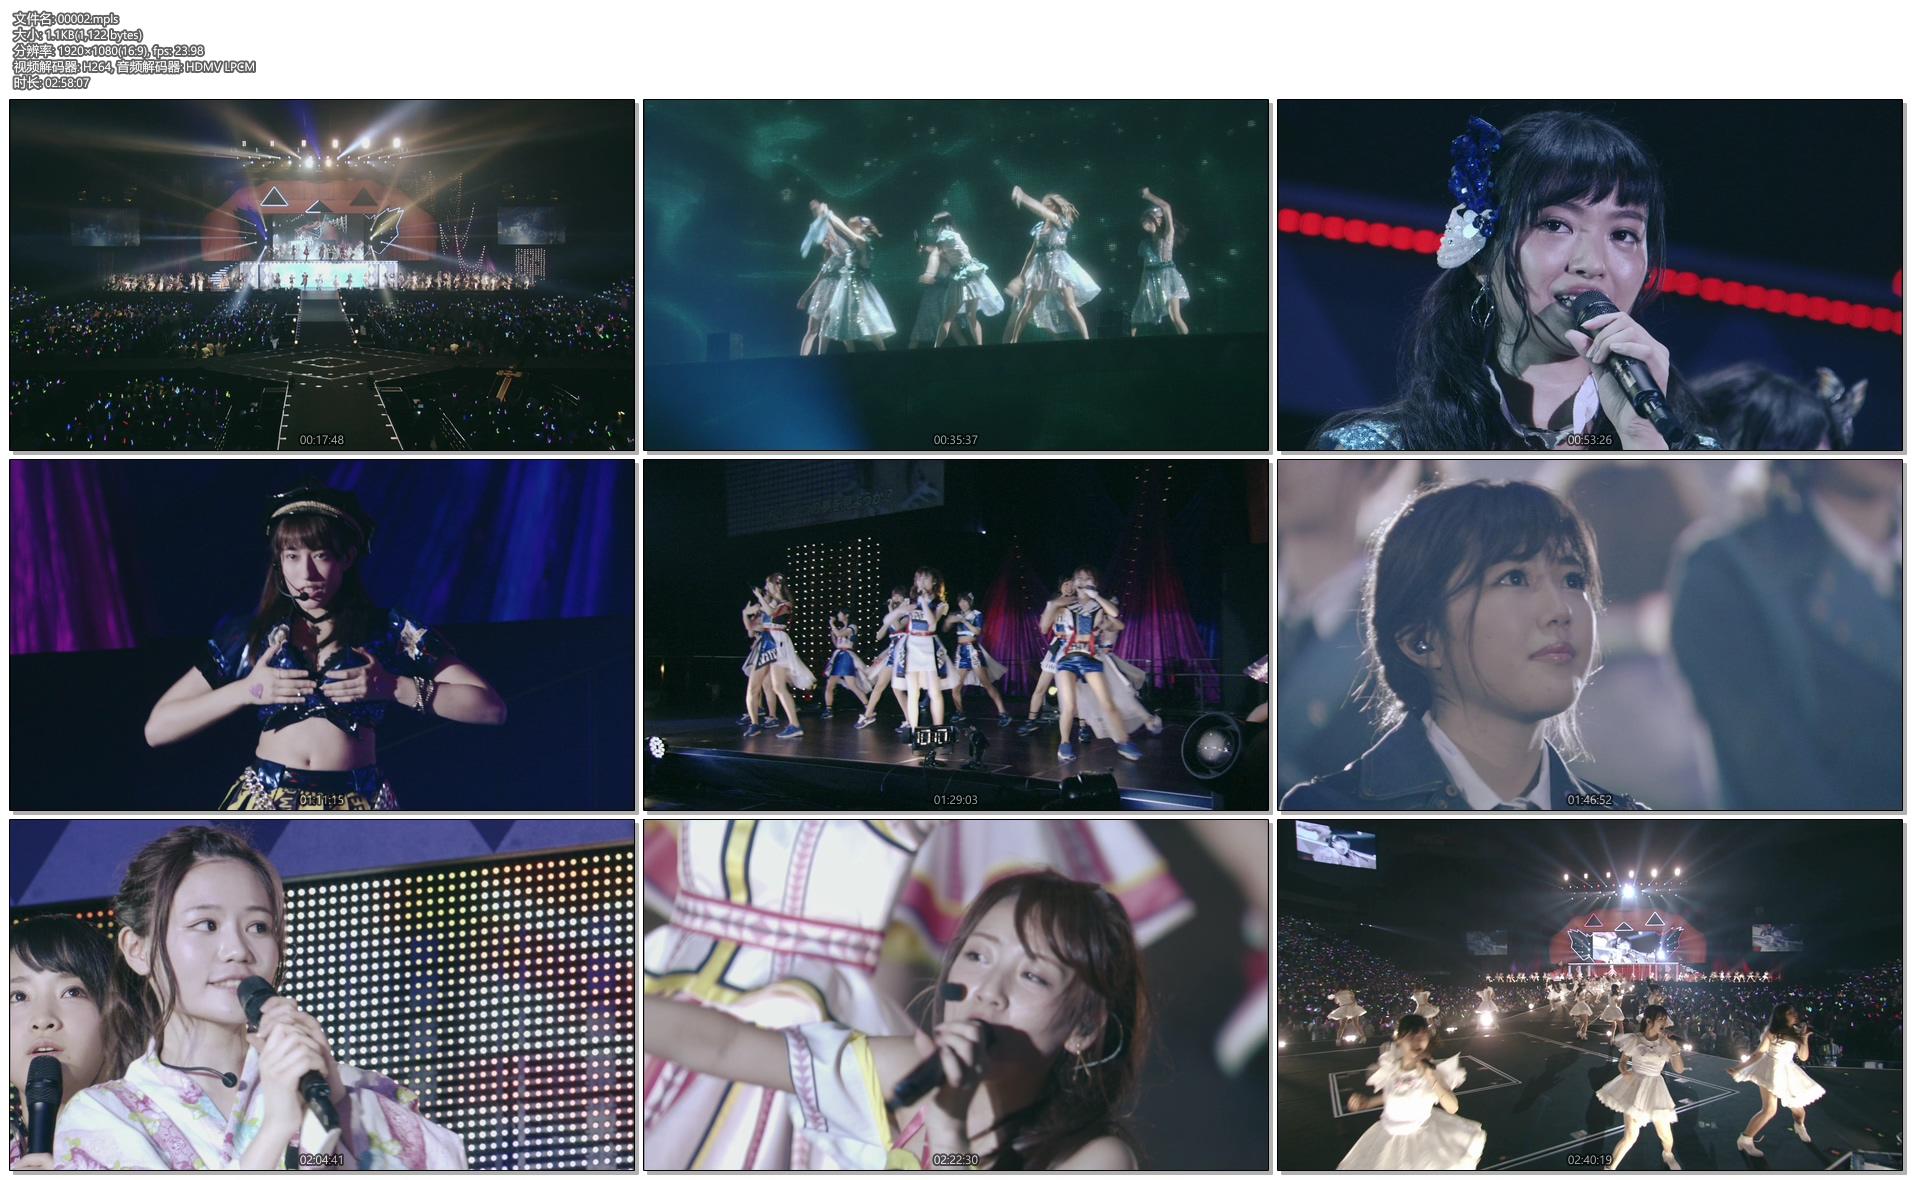 AKB48川荣李奈毕业演唱会 Manatsu no Solo Concert in Saitama Super Arena《BDMV 7碟 226G》蓝光原盘插图(3)